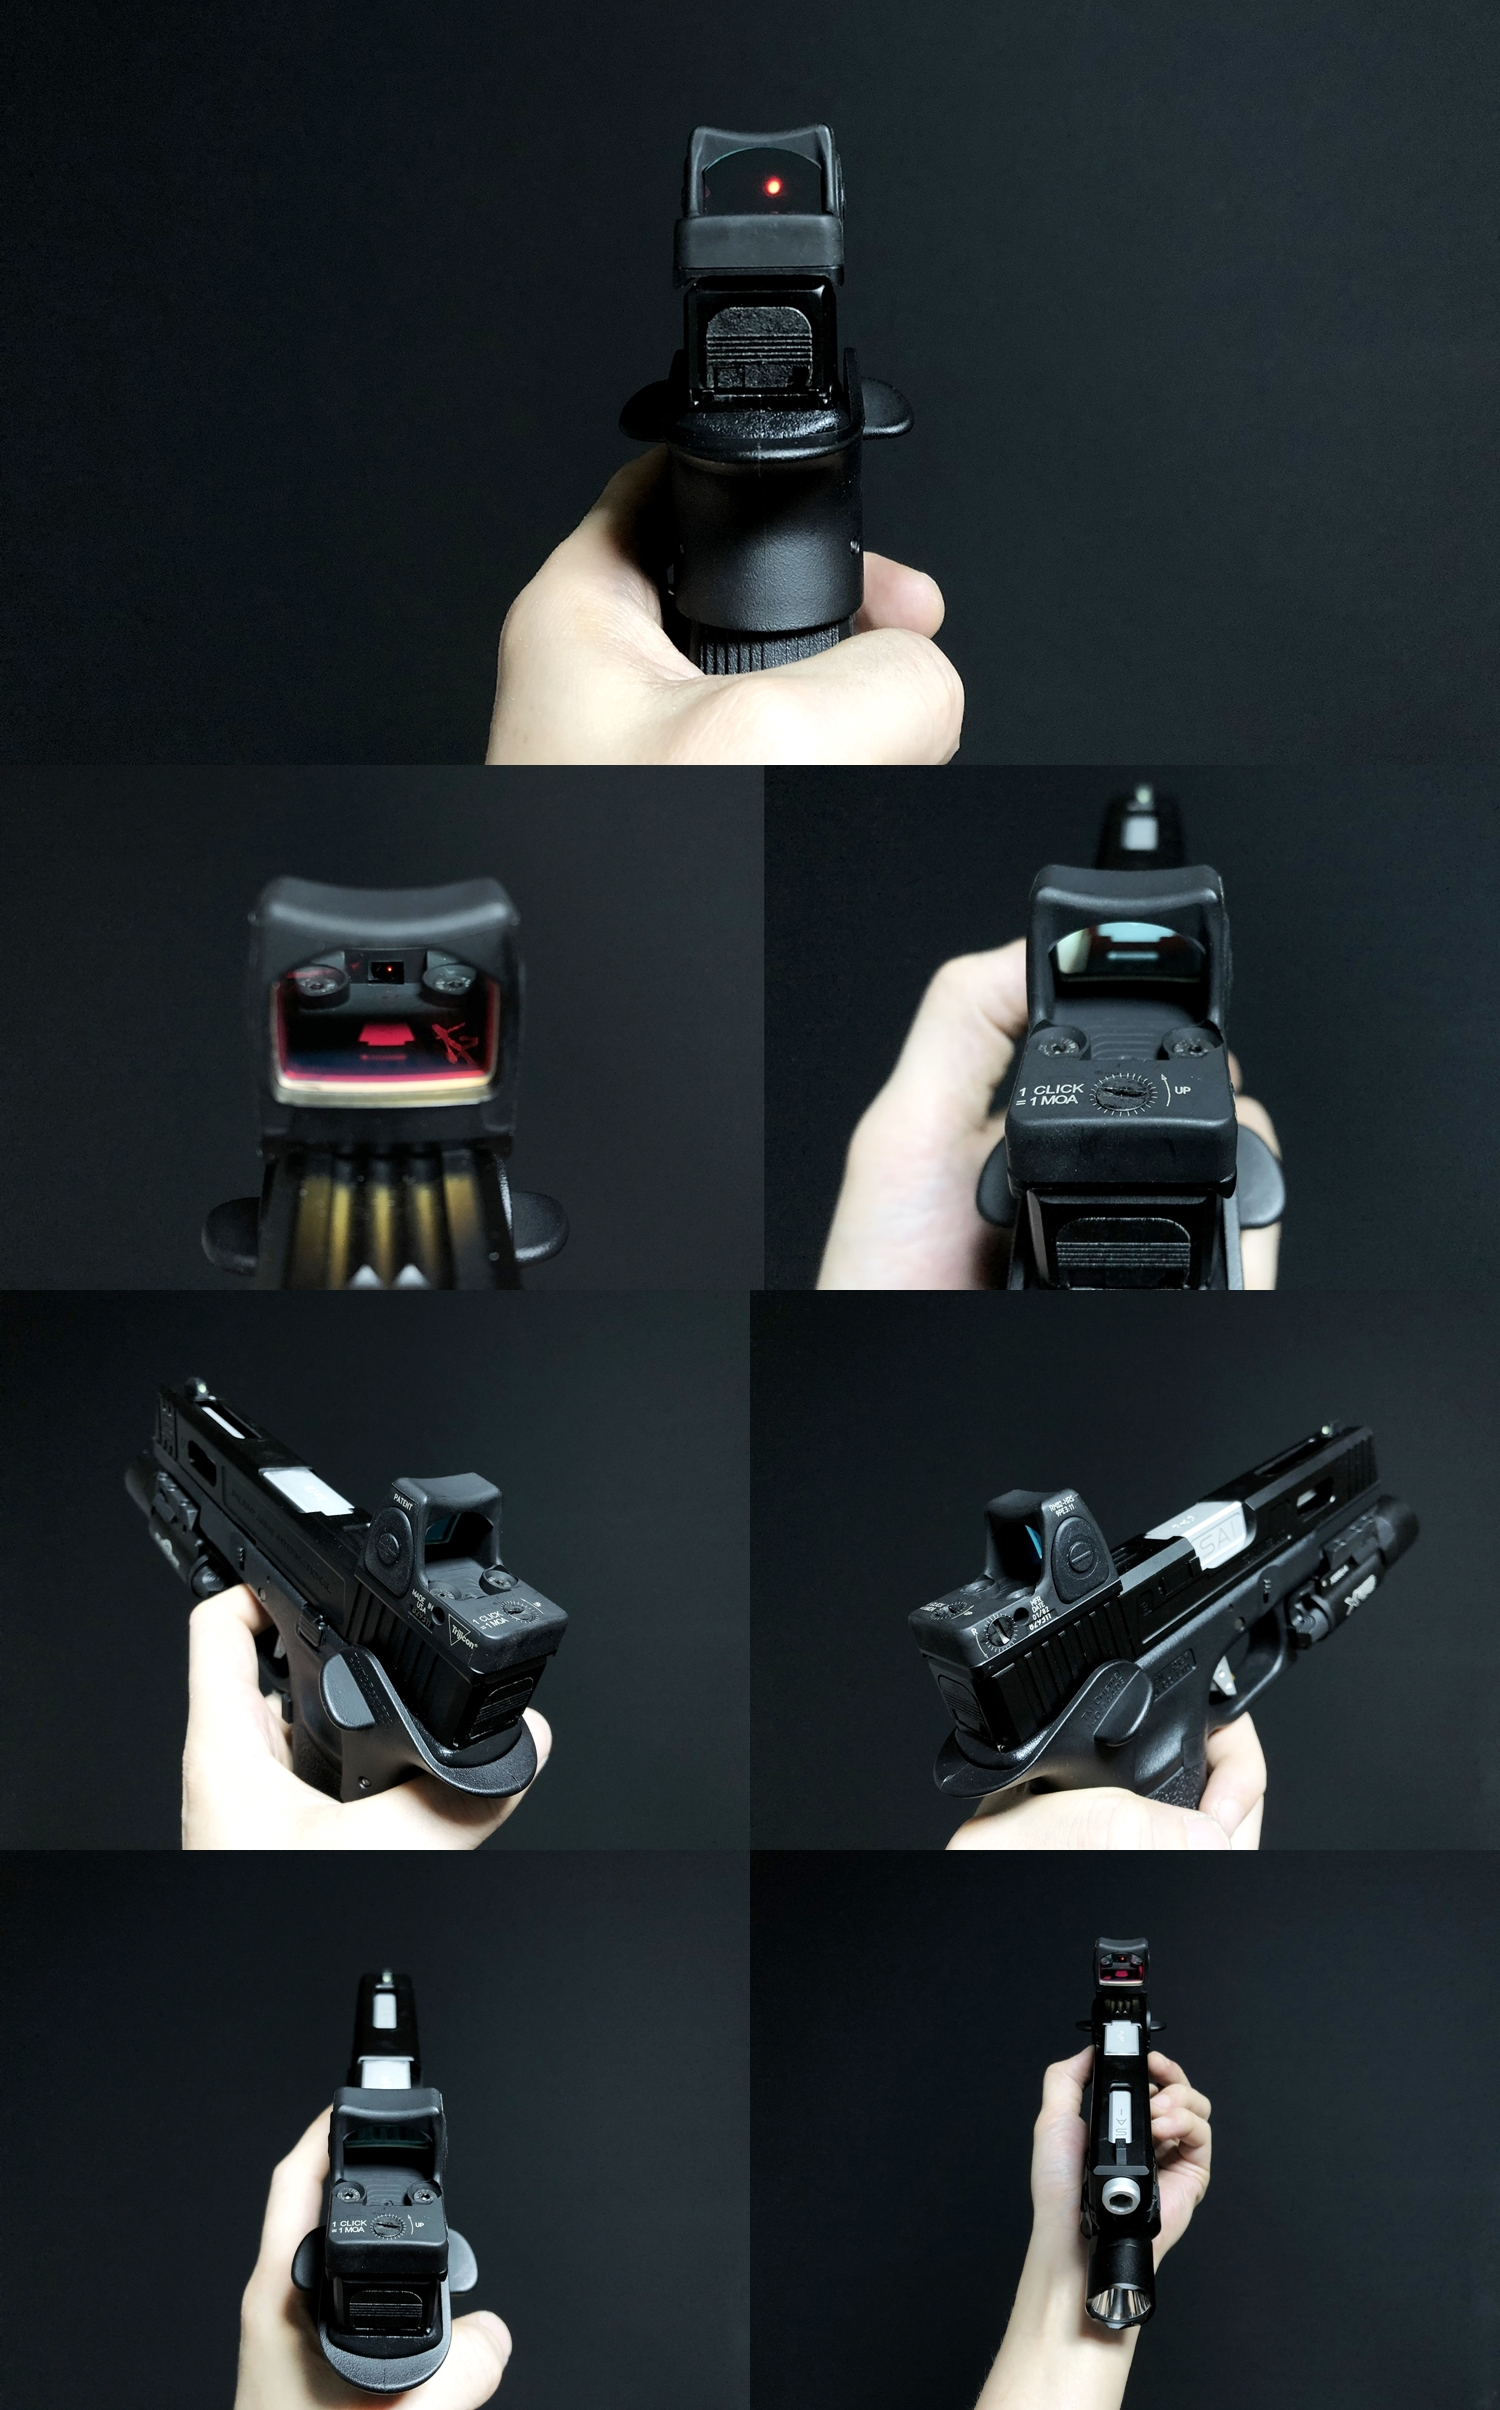 12 HolyWarrior製 RMR Trijicon Type ドットサイト GET!! 噂のHW製 最新 超軽量 複合材質 樹脂 タイプを購入したけど速攻で仲間に奪われました(笑)!! Glock G17 GBB カスタム!! 購入 開封 取付 加工 レビュー!!